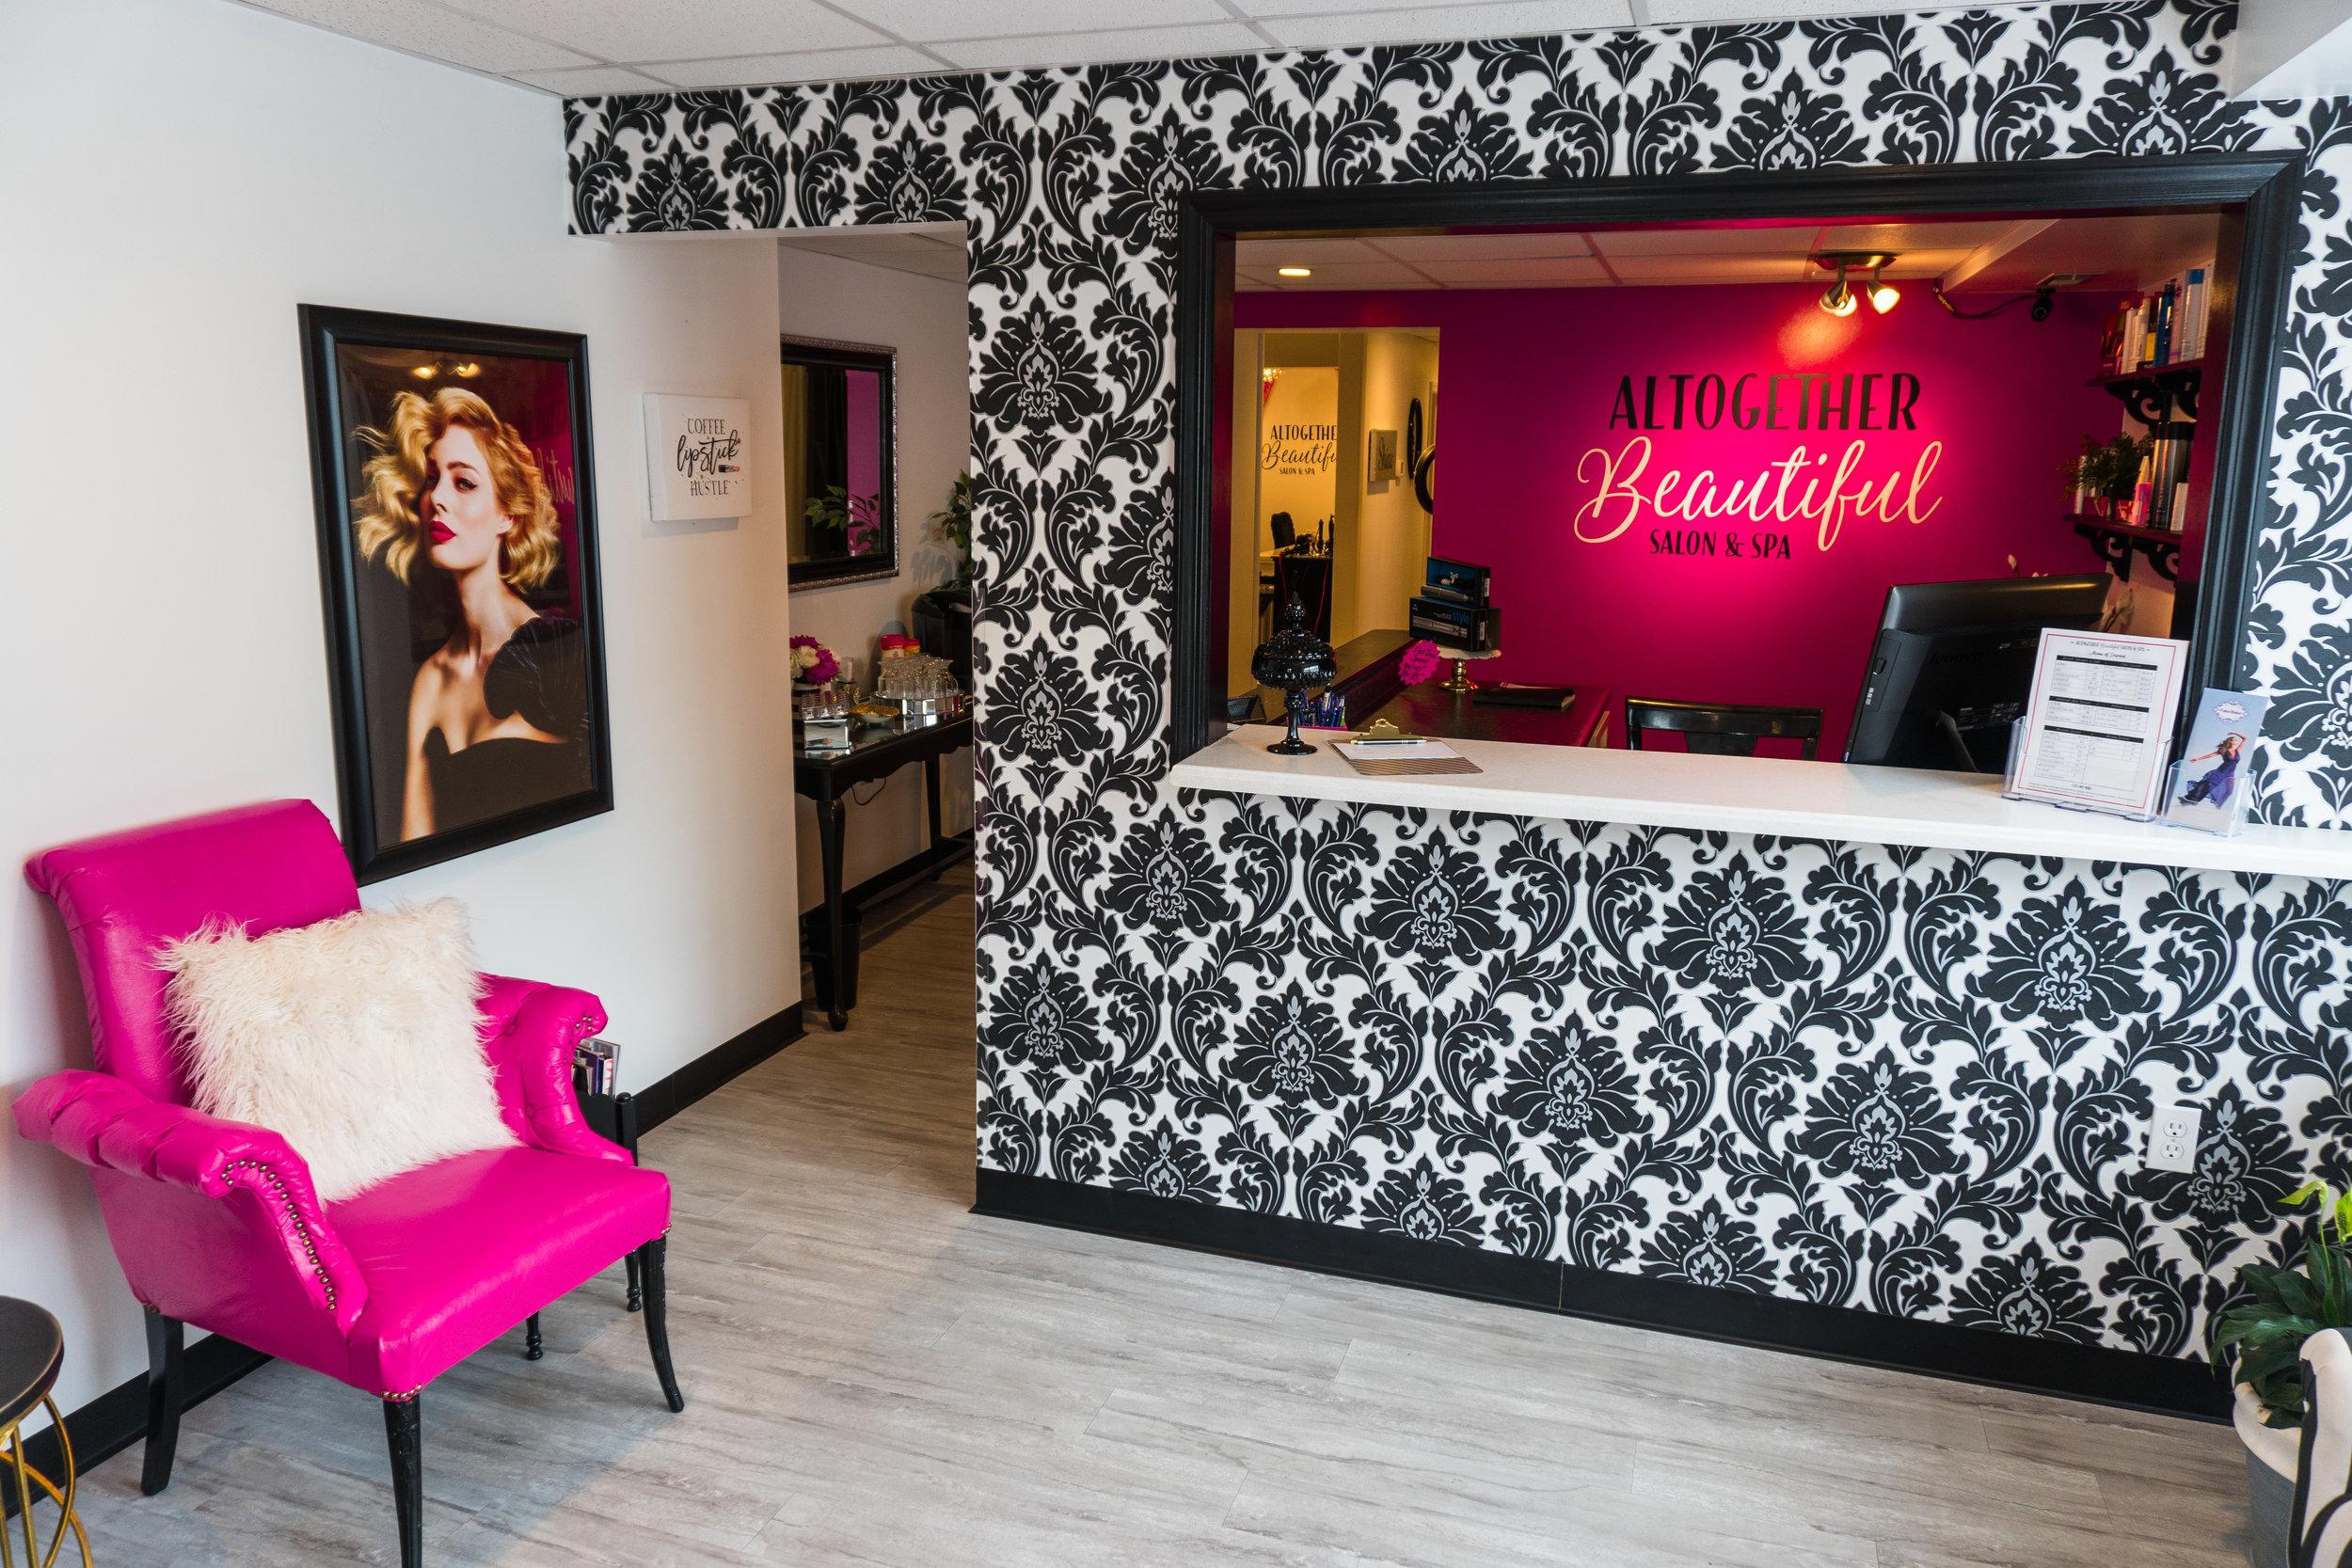 Altogether Beautiful Salon Spa